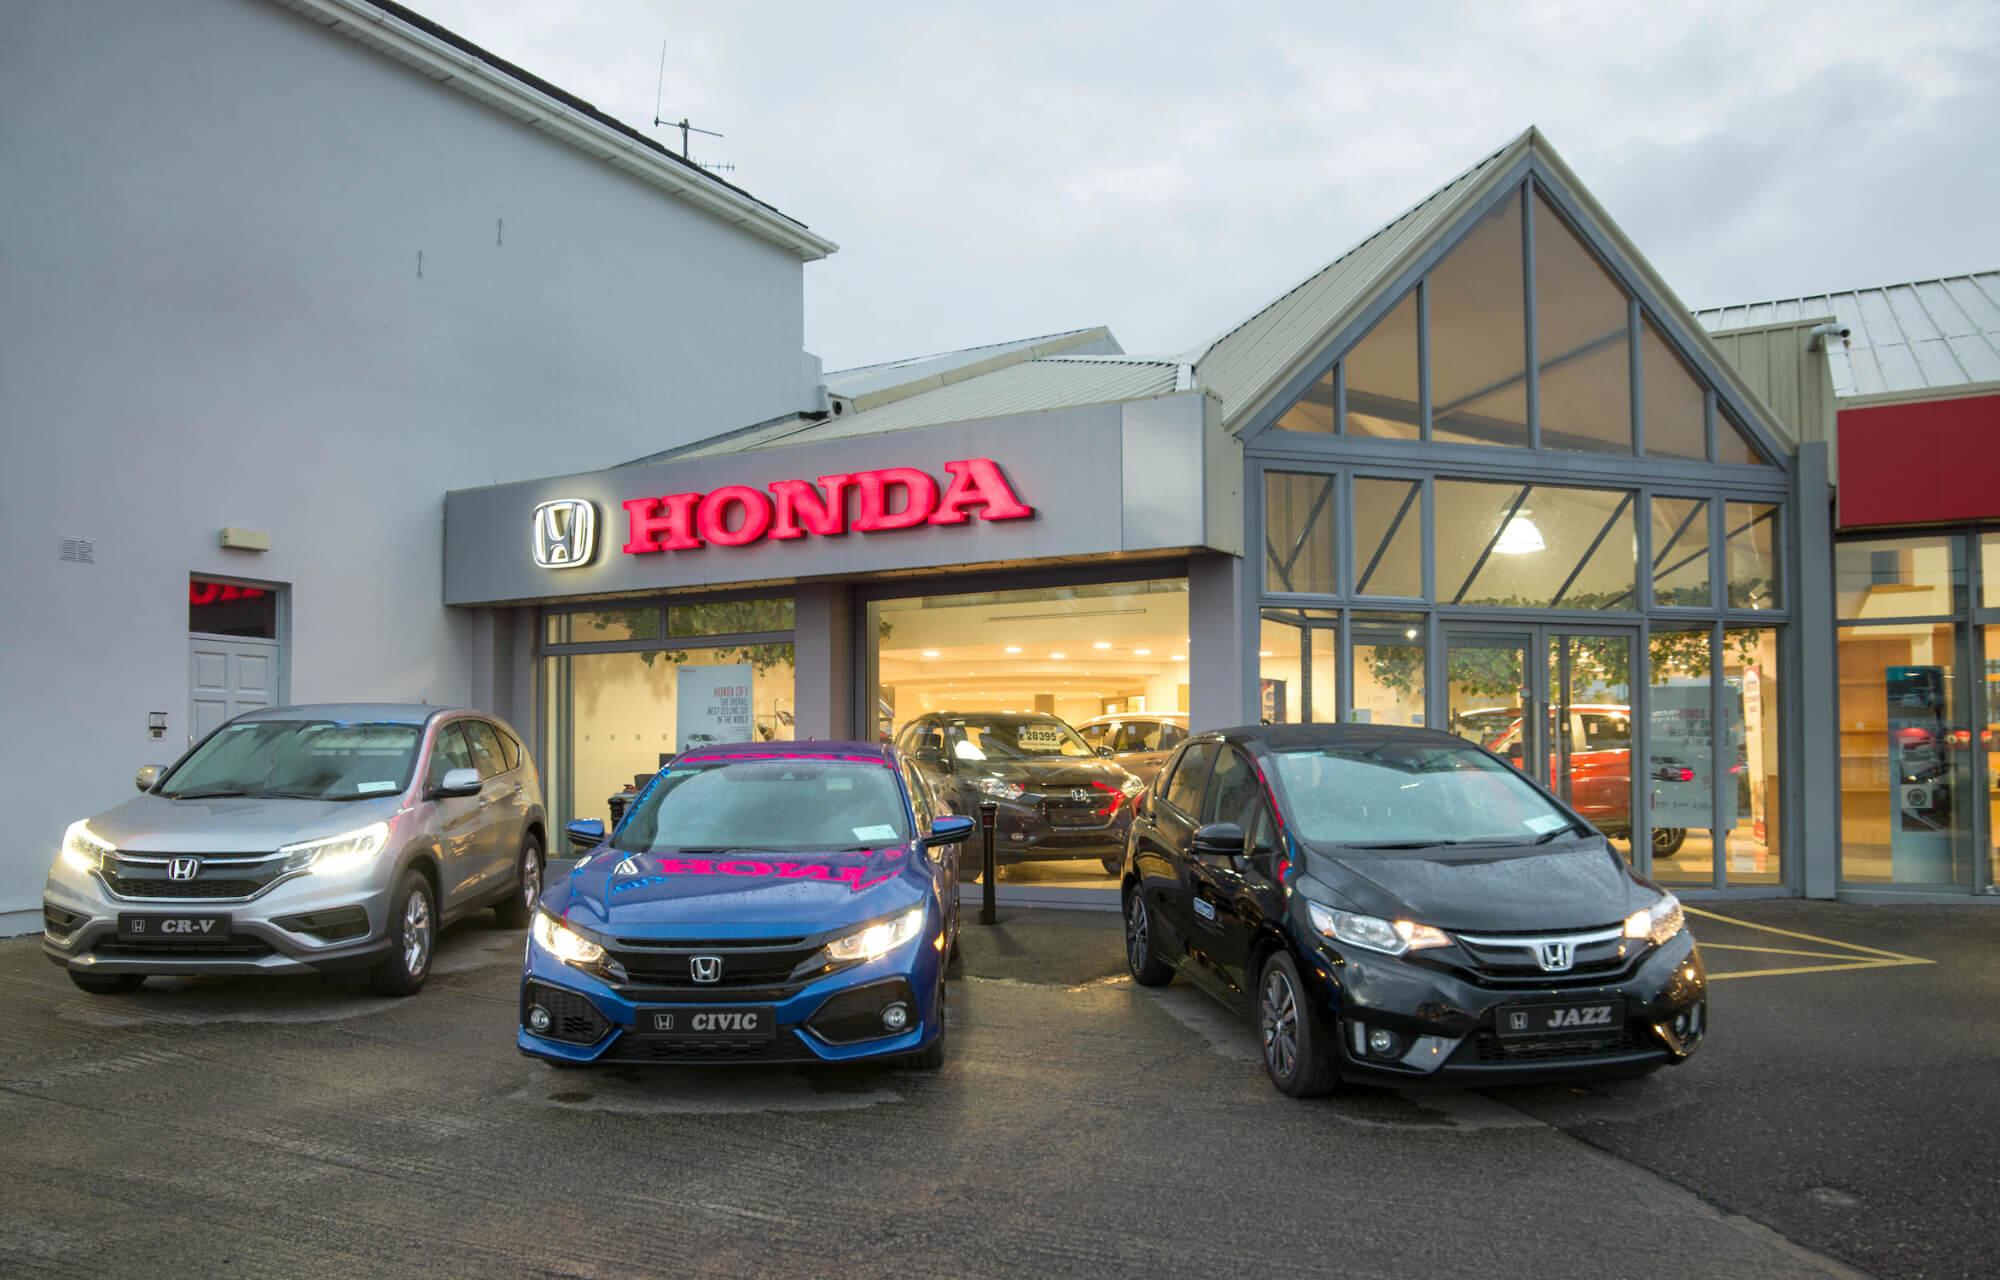 McEligott's Honda Centre Tralee